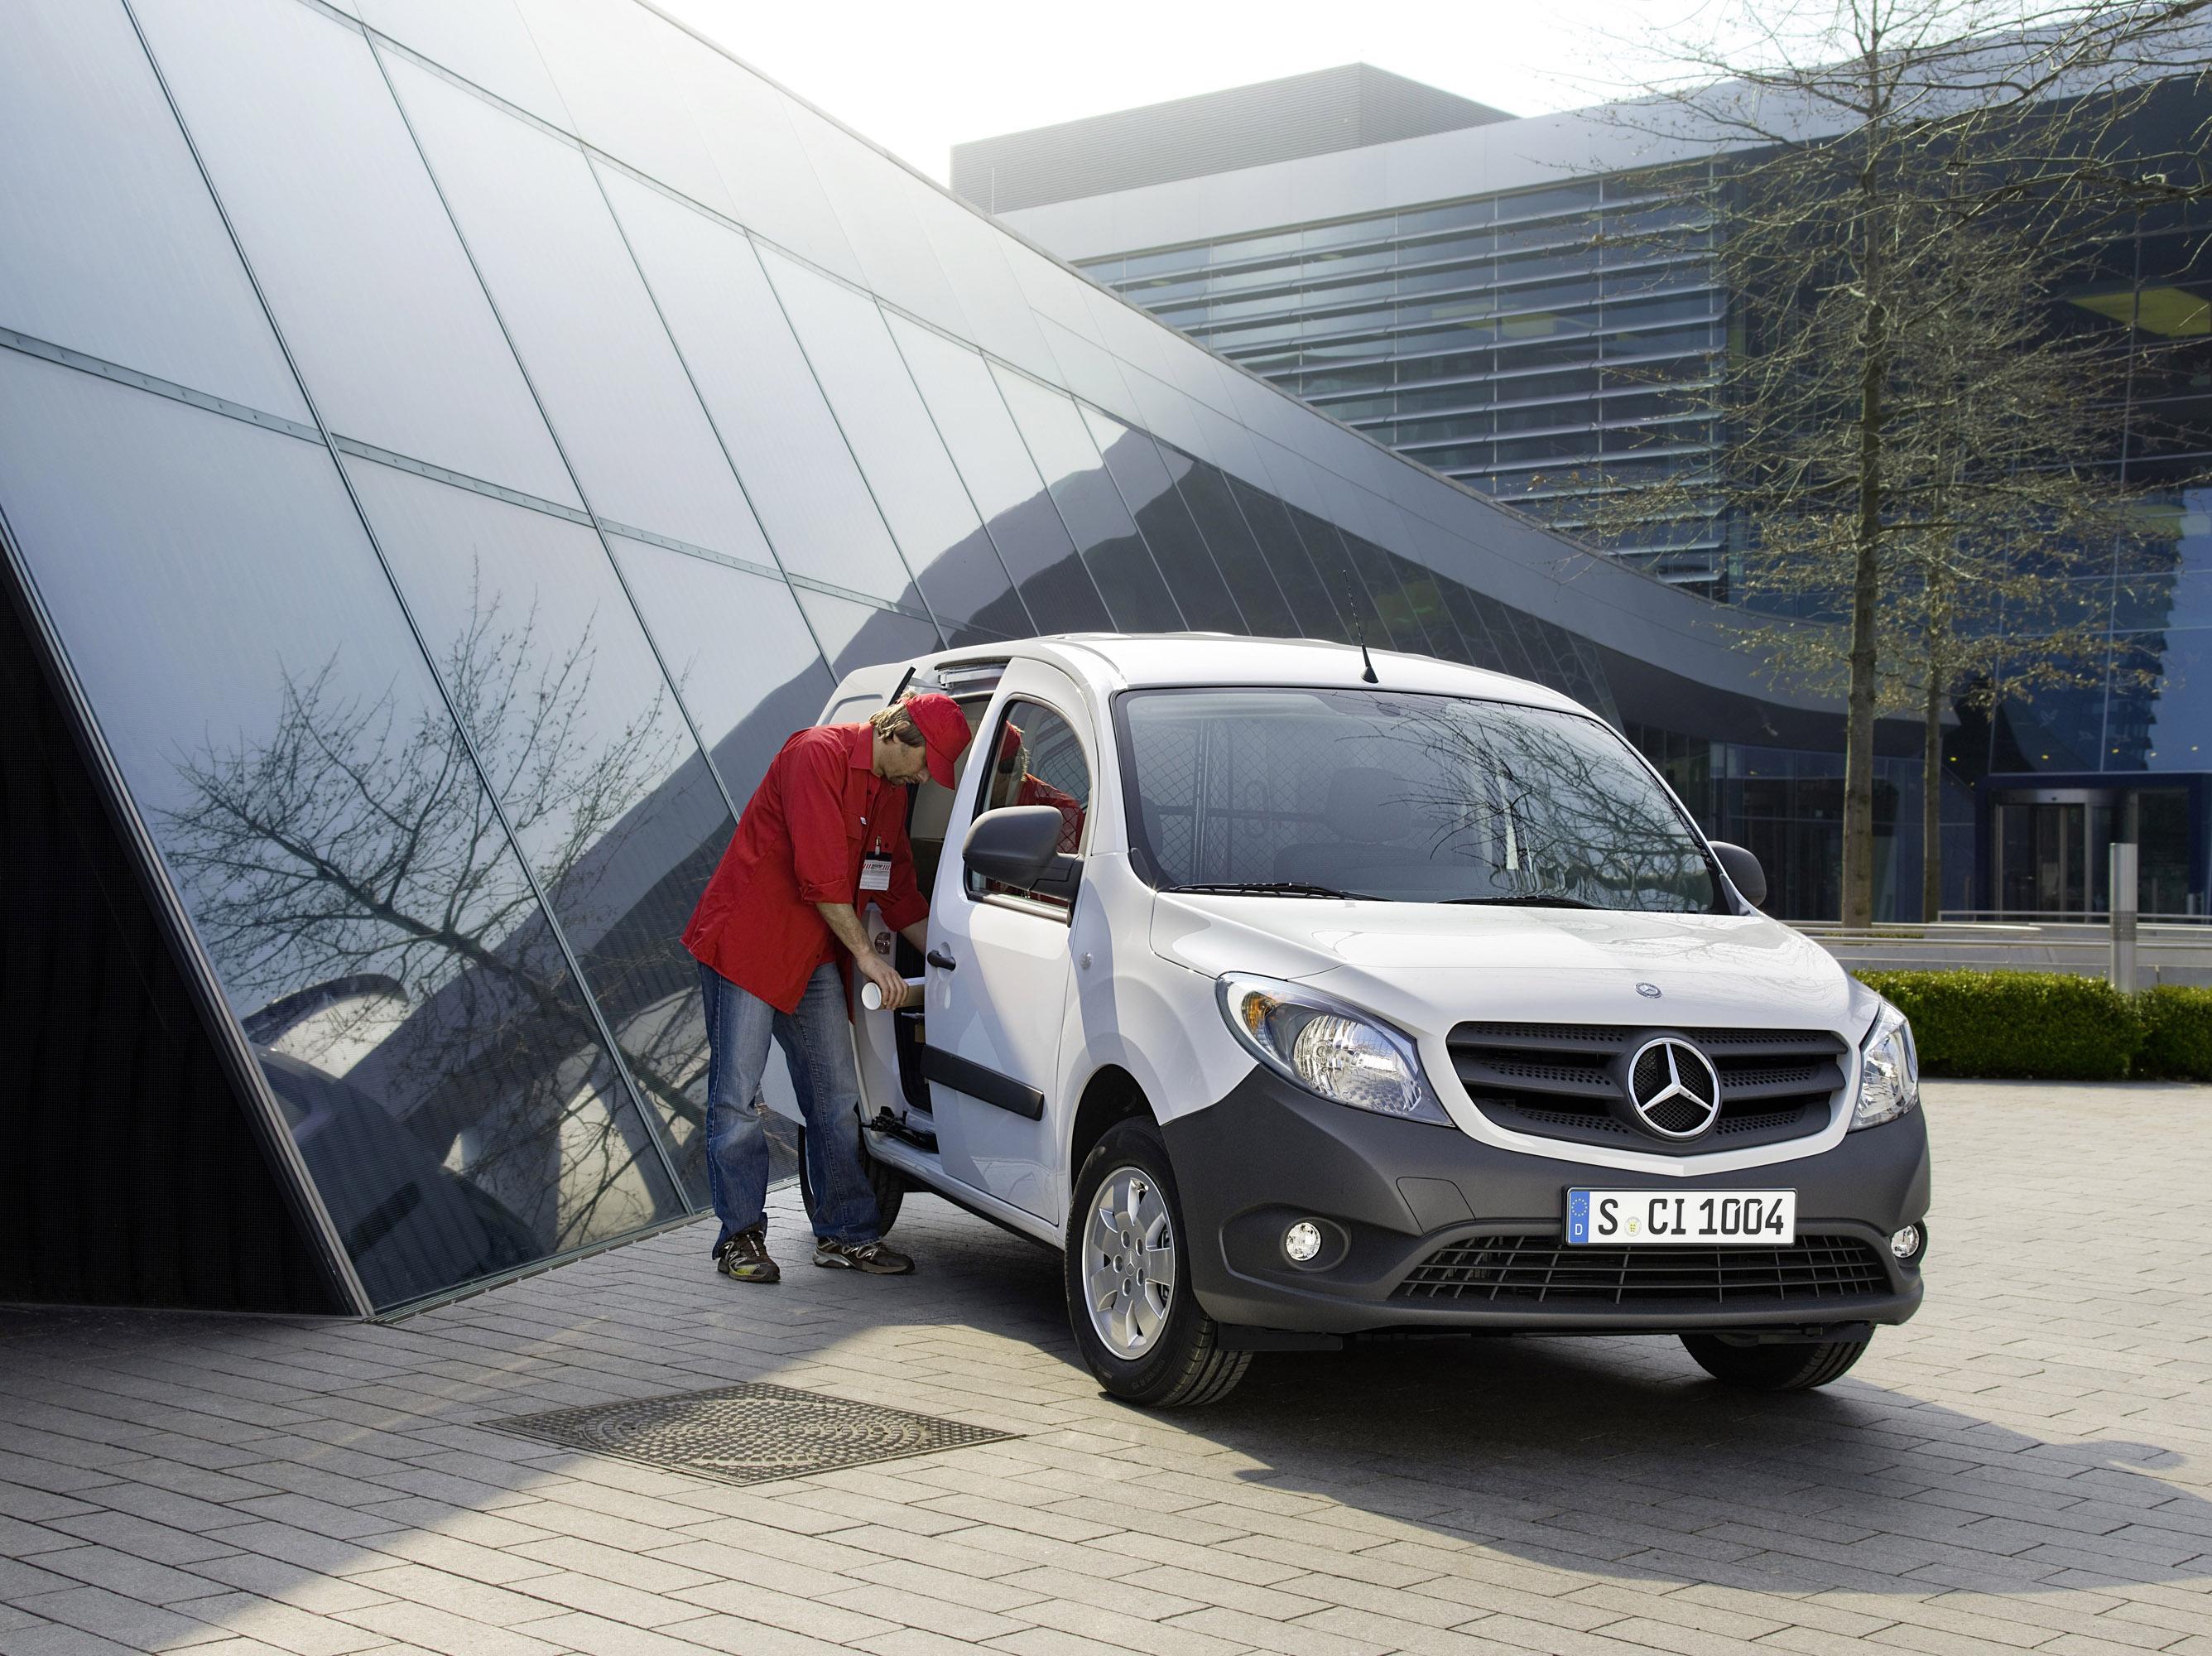 Mercedes-Benz Citan photo #1